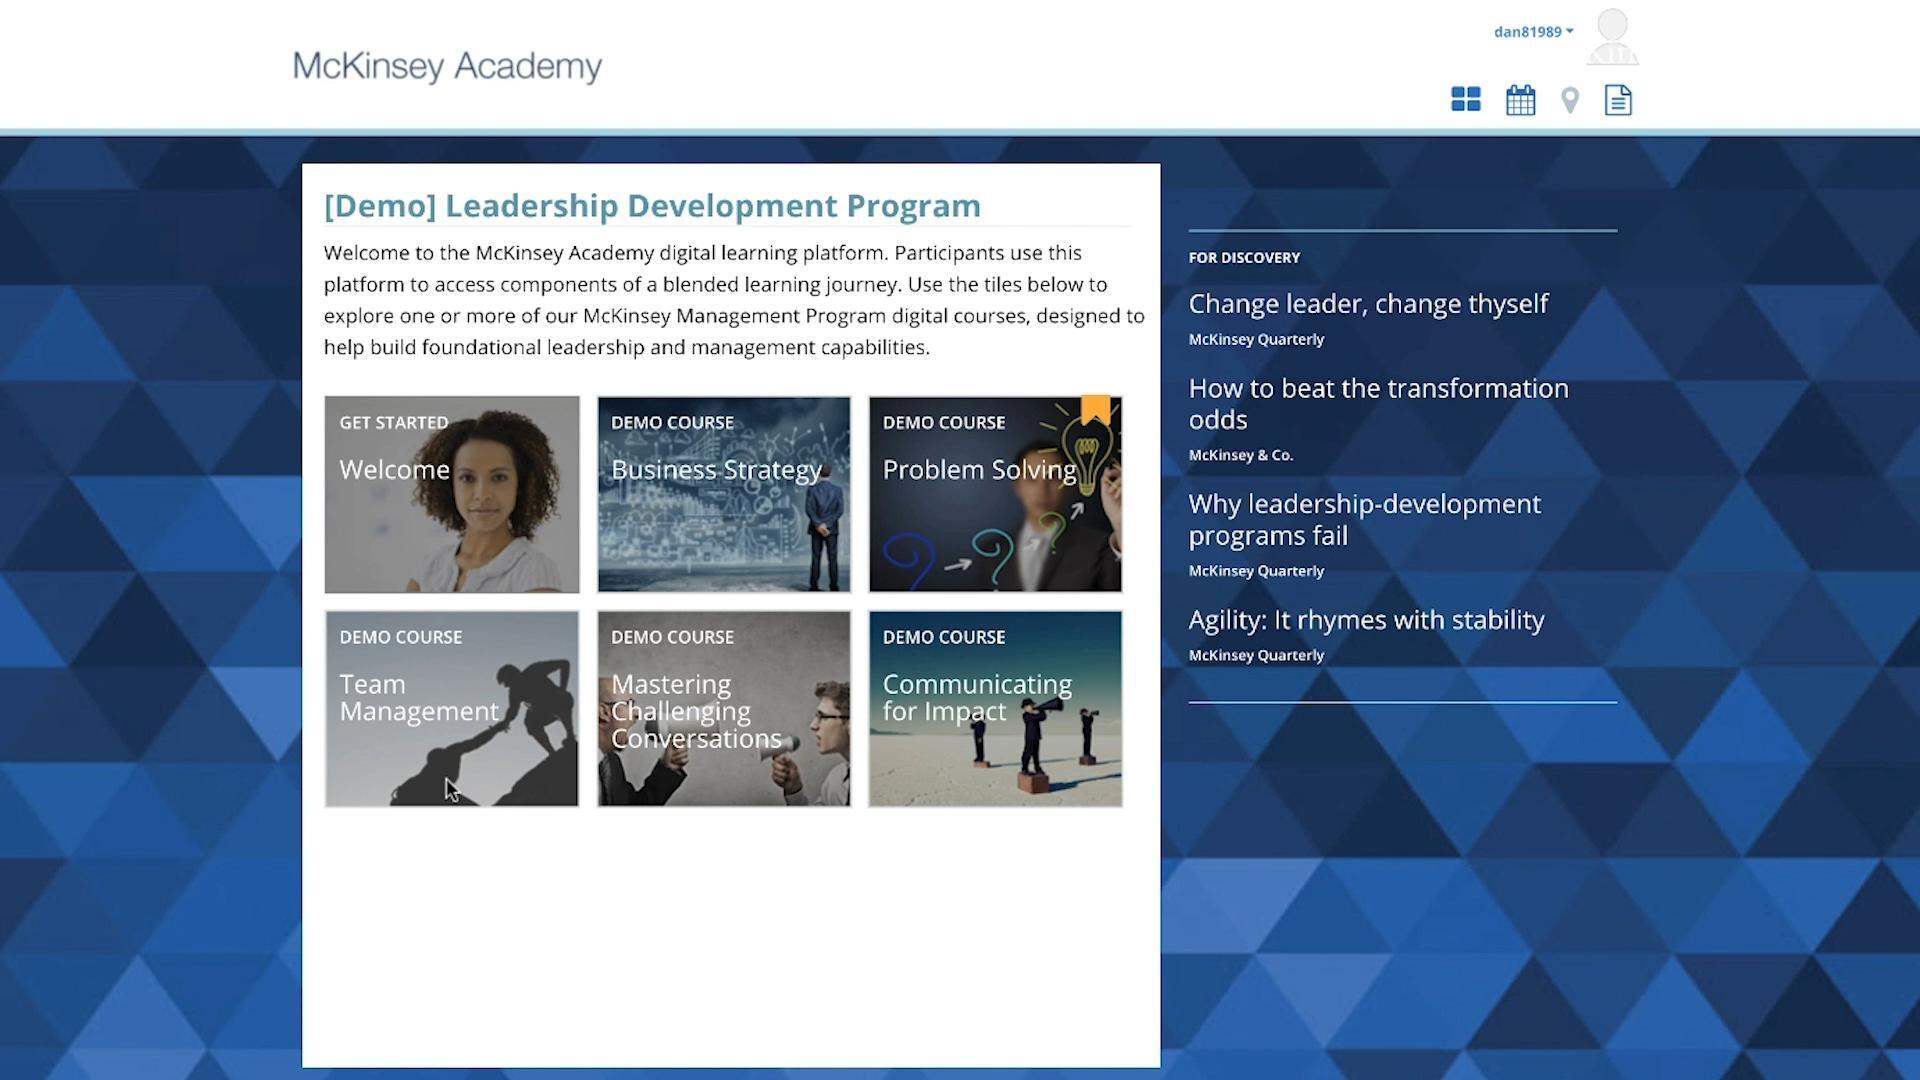 McKinsey Academy Technology Platform | Learning Programs for